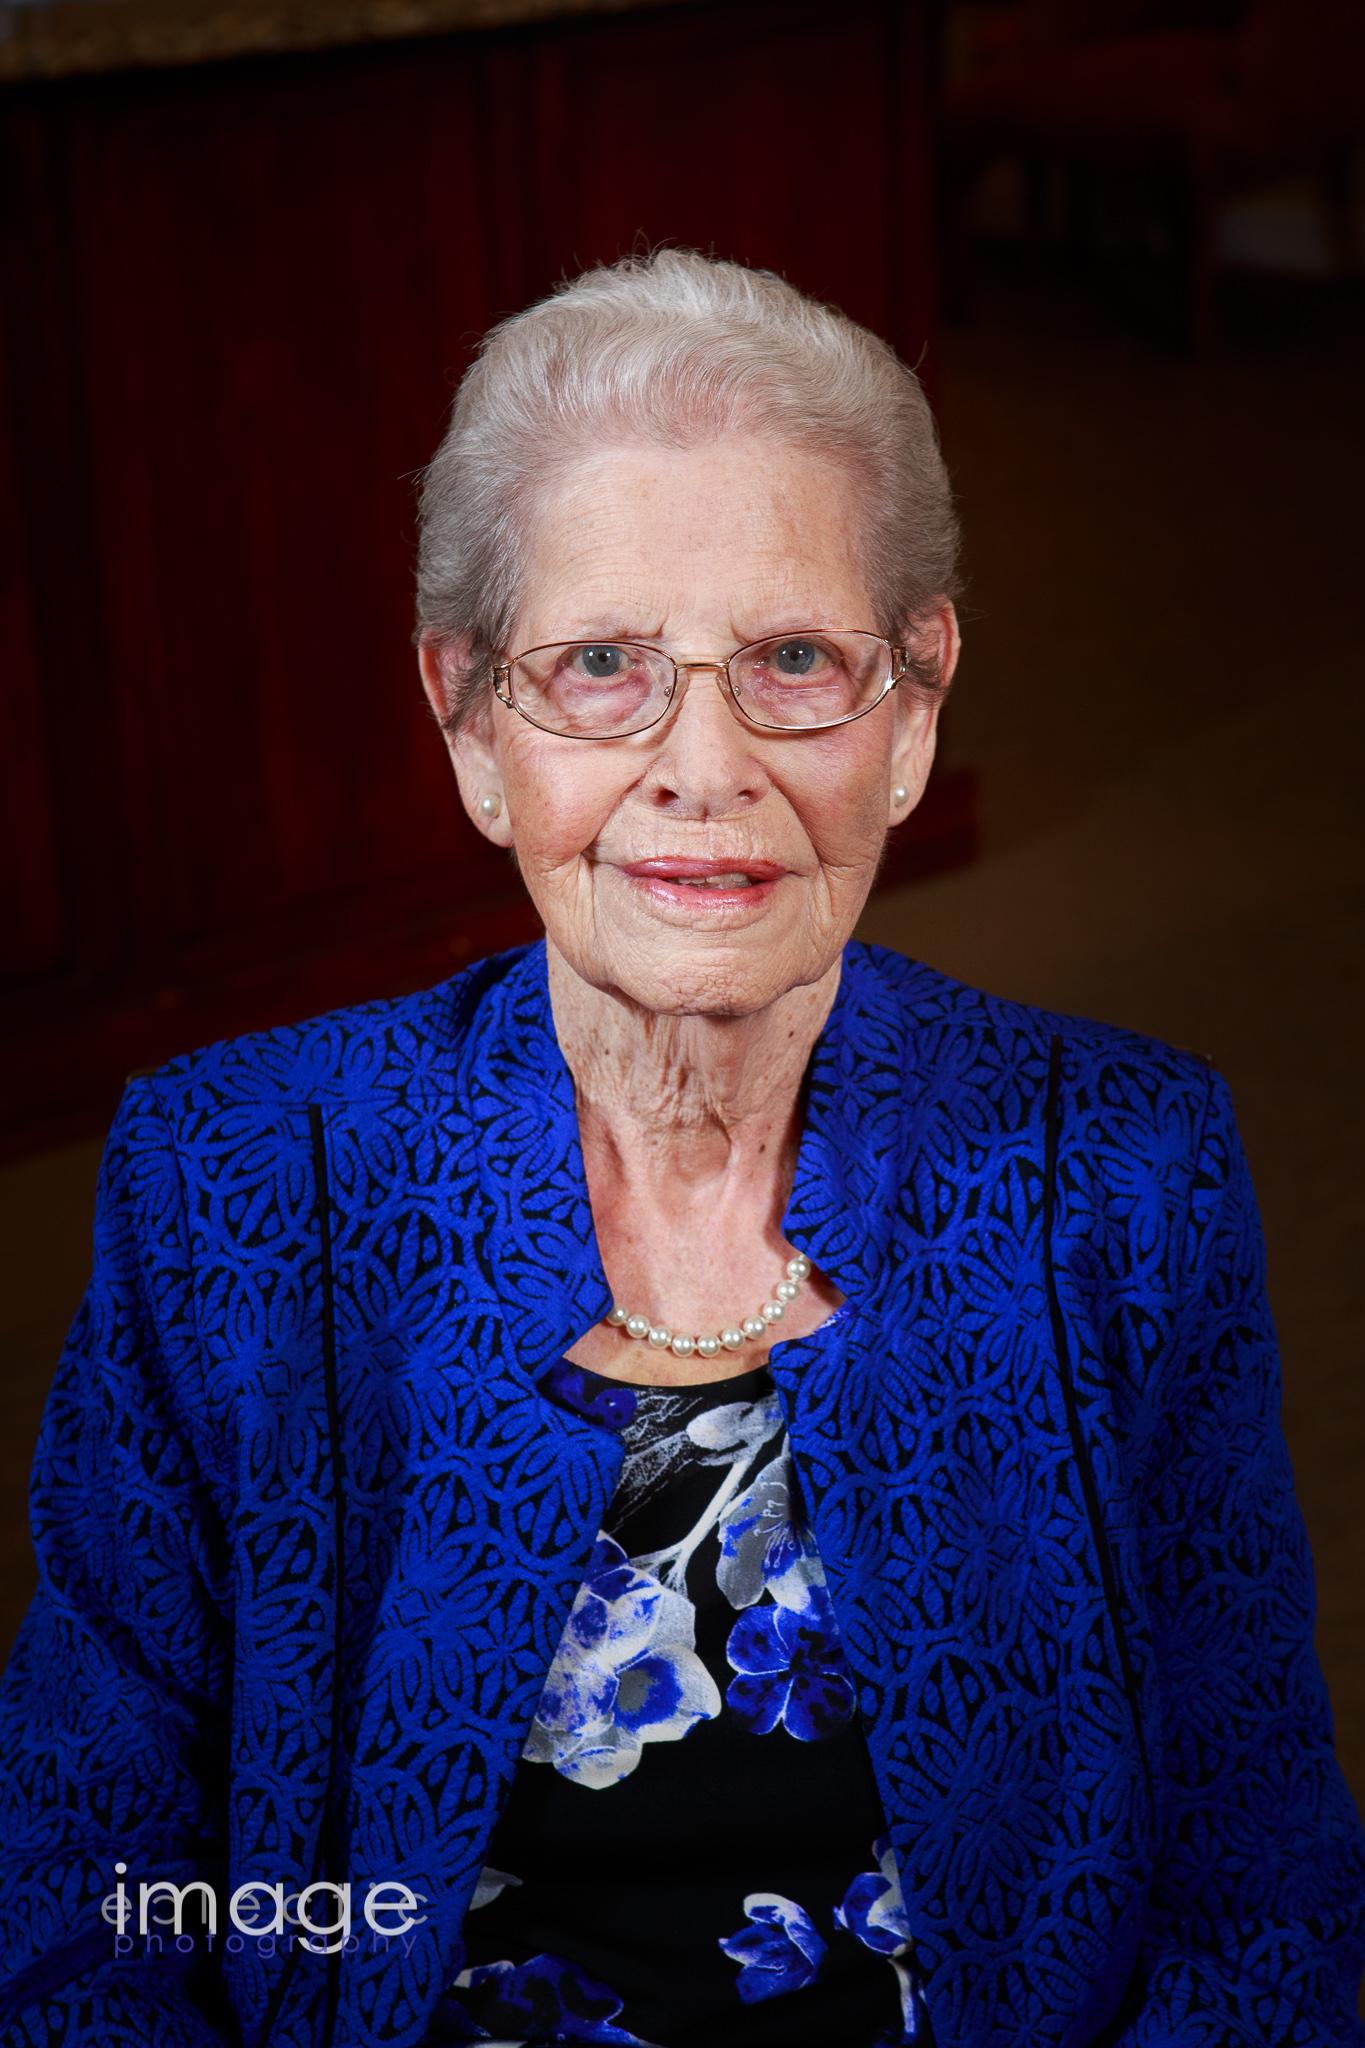 Elizabeth at 100